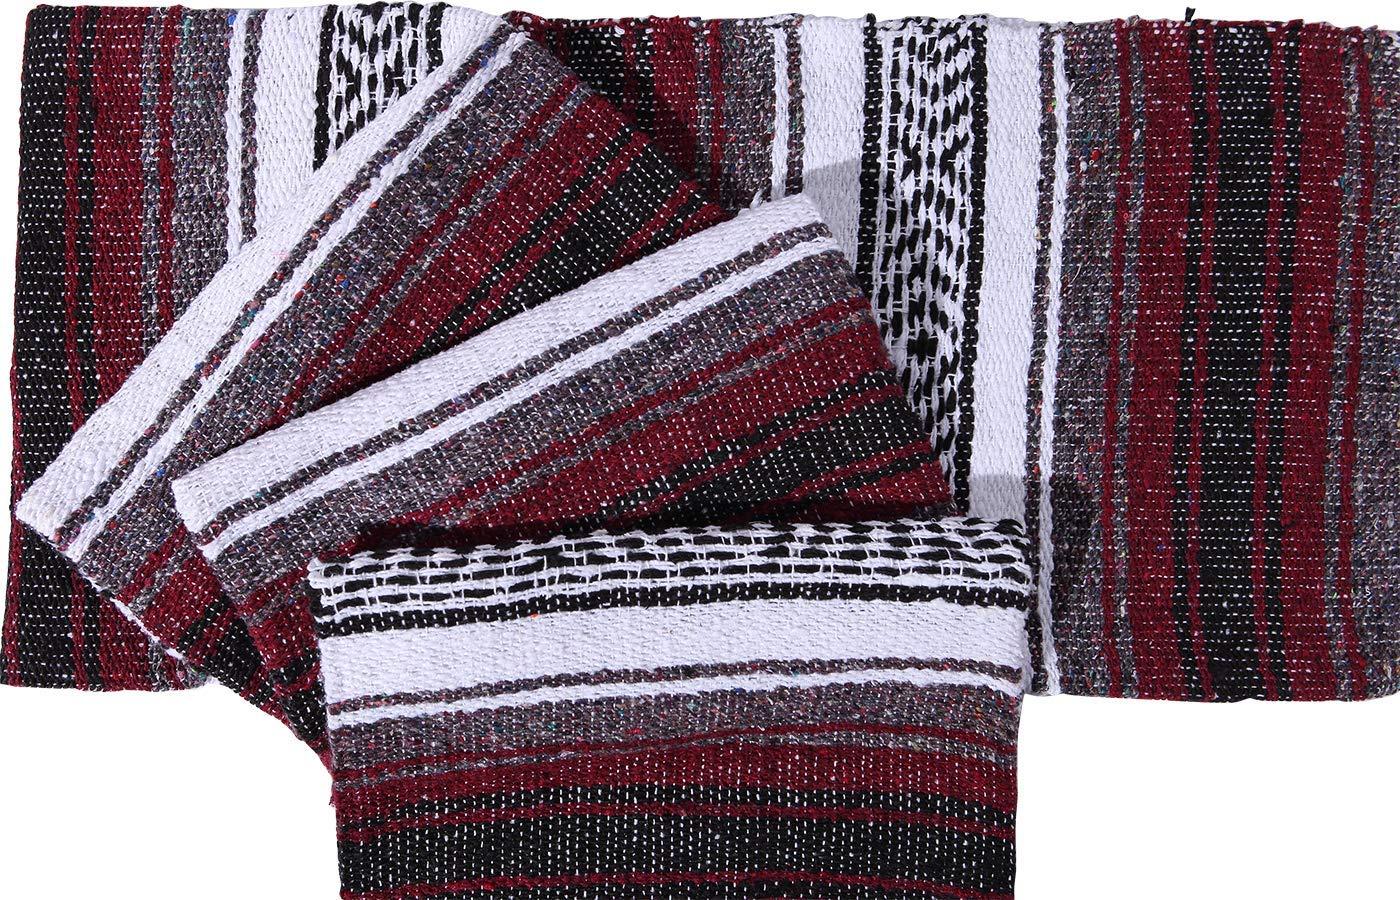 El Paso Designs Genuine Mexican Falsa Blanket - Yoga Studio Blanket, Colorful, Soft Woven Serape Imported from Mexico (Burgundy) by El Paso Designs (Image #4)